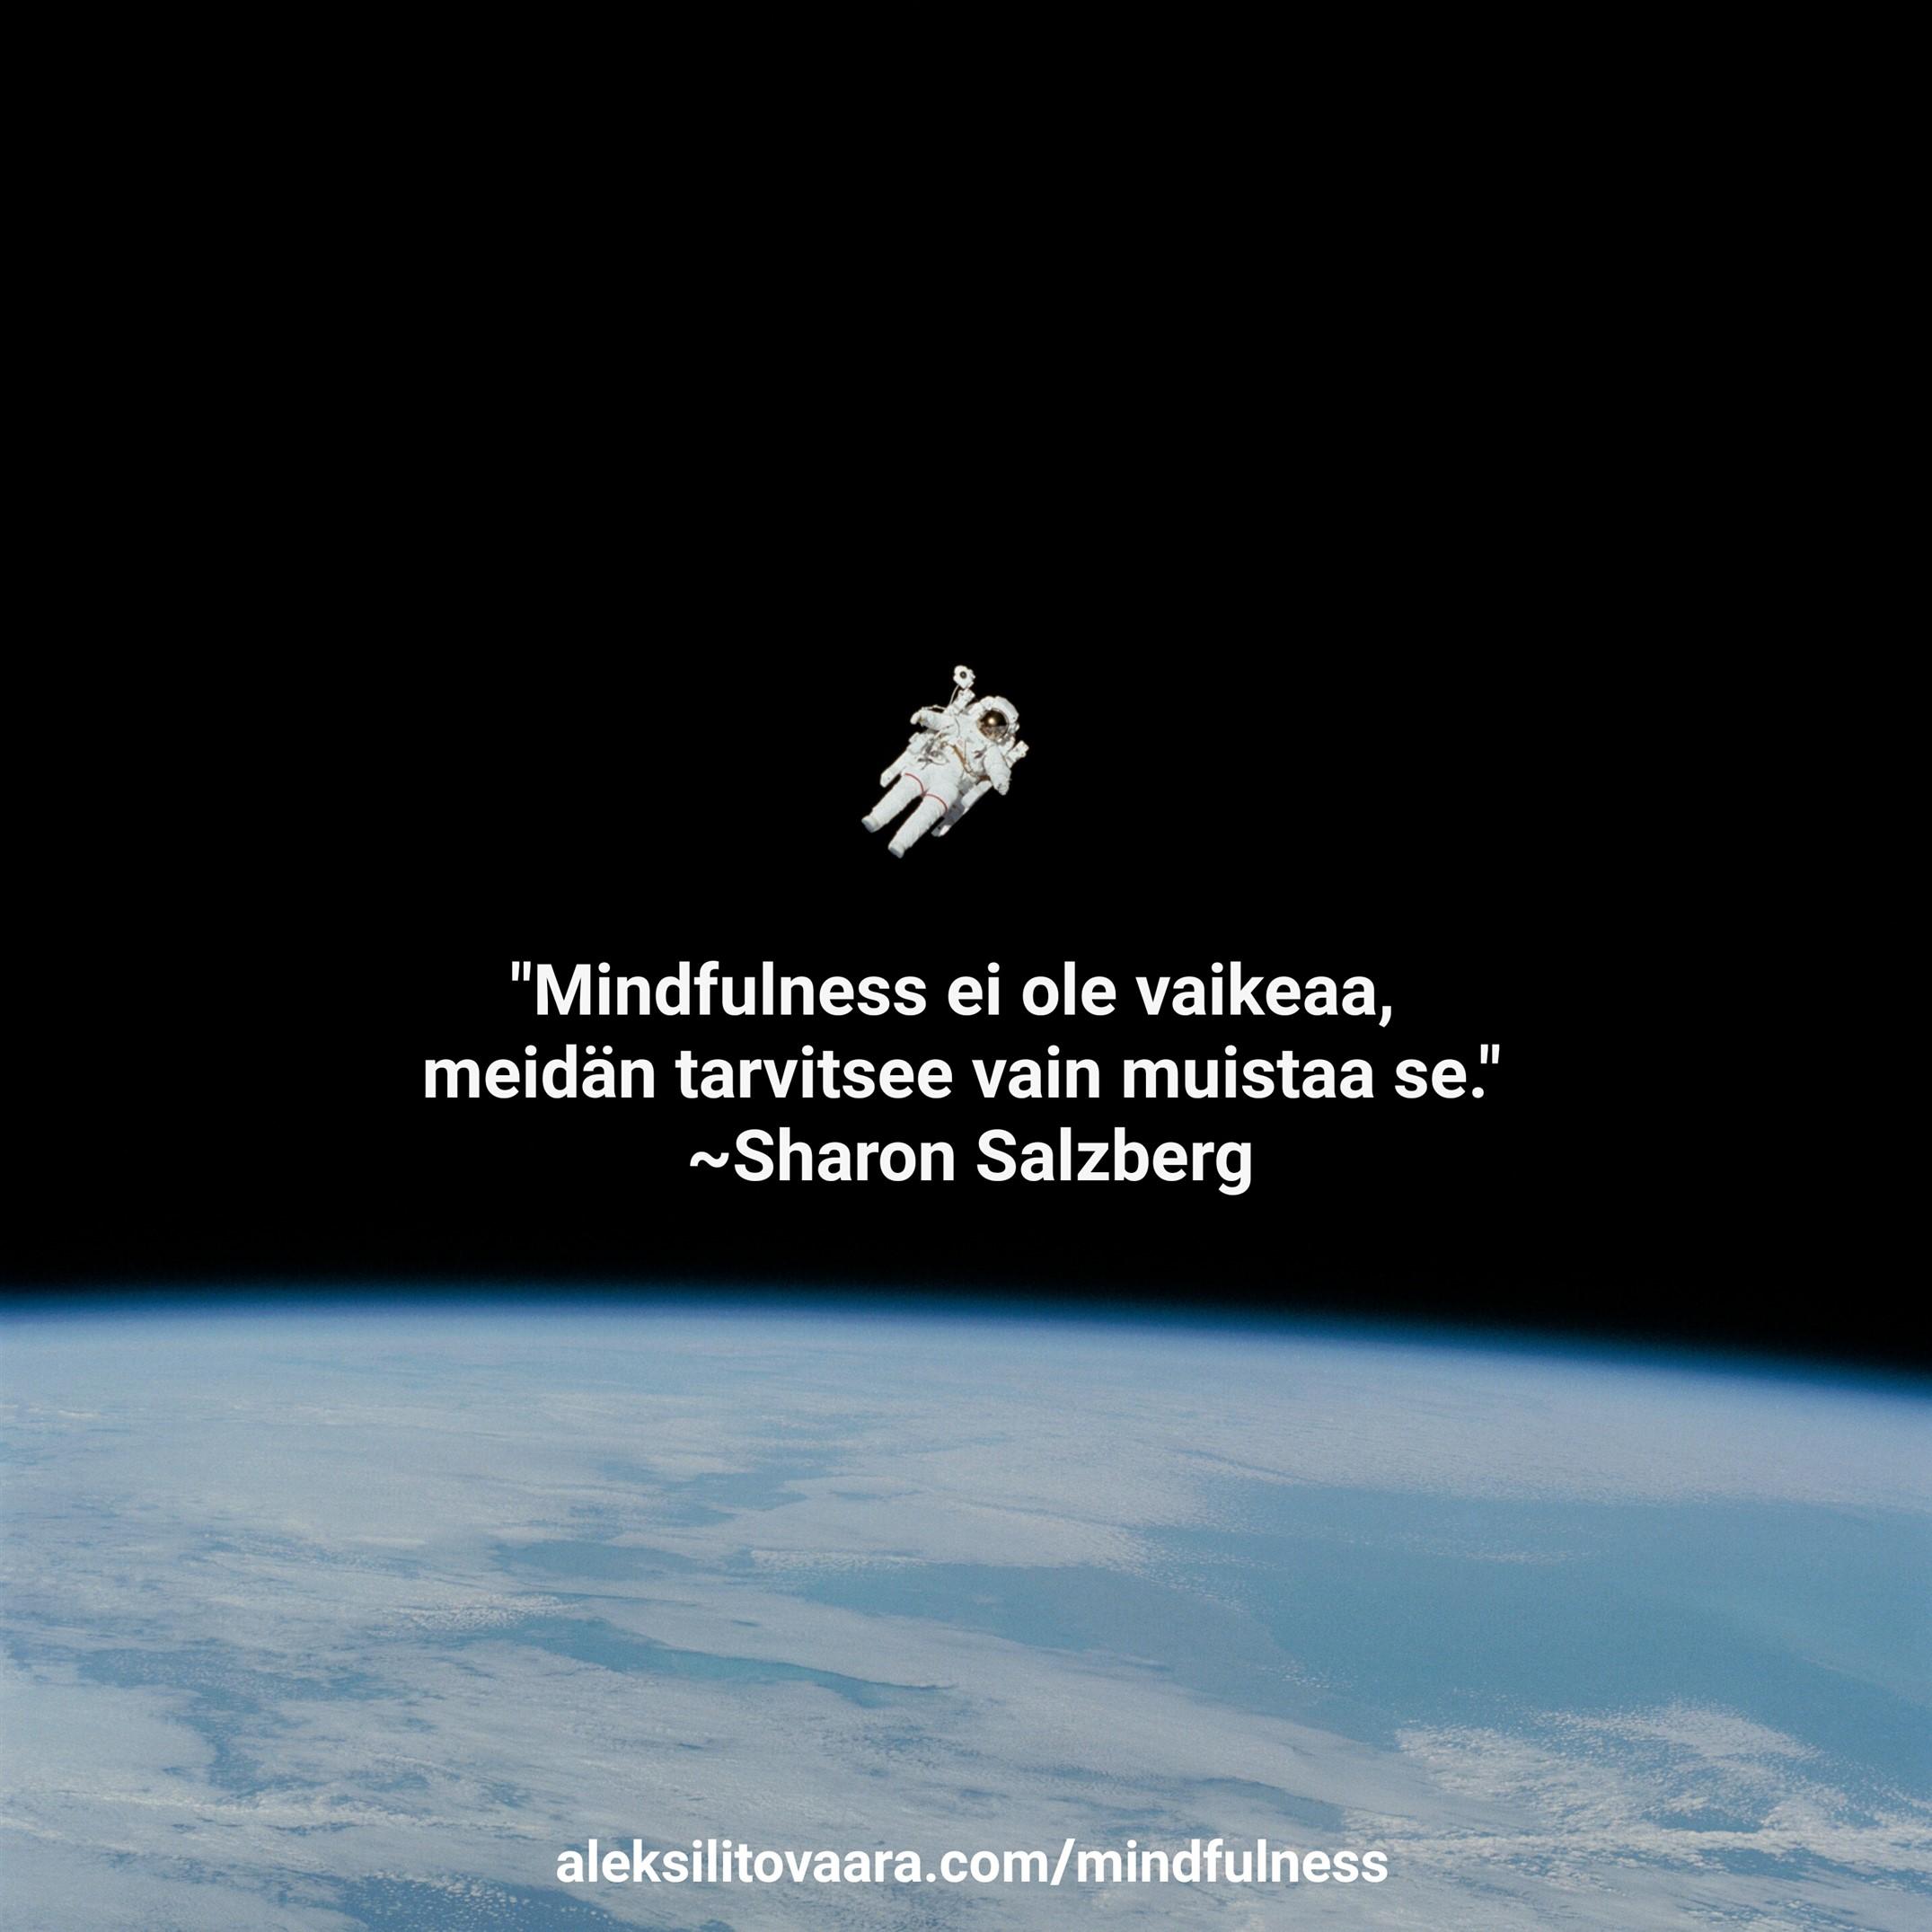 mindfulness työpäivä, mindfulness työkyky, mindfulness työpaikka, mindfulness suorituskyky, mindfulness työyhteisö, mindfulness organisaatio, mindfulness yritys, mindfulness, mindfulnes, mindfulness kurssi, mindfulness-kurssi, mindfulnes kurssi, mindfulnes-kurssi, mindfulness verkkokurssi, mindfulness-verkkokurssi, mindfulnes verkkokurssi, mindfulnes-verkkokurssi, mindfulnes, tietoisuustaidot, läsnäolo, tietoisuustaito, mbsr, meditaatio, tietoinen hyväksyvä läsnäolo, mindfulness-harjoitus, mindfulness-meditaatio, mindfulness-työ, mindfulness työ, mindfulness työpaikalla, mindfulness-työpaikalla, mindfulness työssä, mindfulness johtaja, mindful leader, mindful esimies, mind ful, mind fullness, mindfullness, mindfulness kurssi, työhyvinvointi, mindfulness kirja, stressinhallinta, mindfulness harjoitukset, keskittyminen, mindfulness työpaikalla, mindfulness mobiilisovellus, mindfulness app